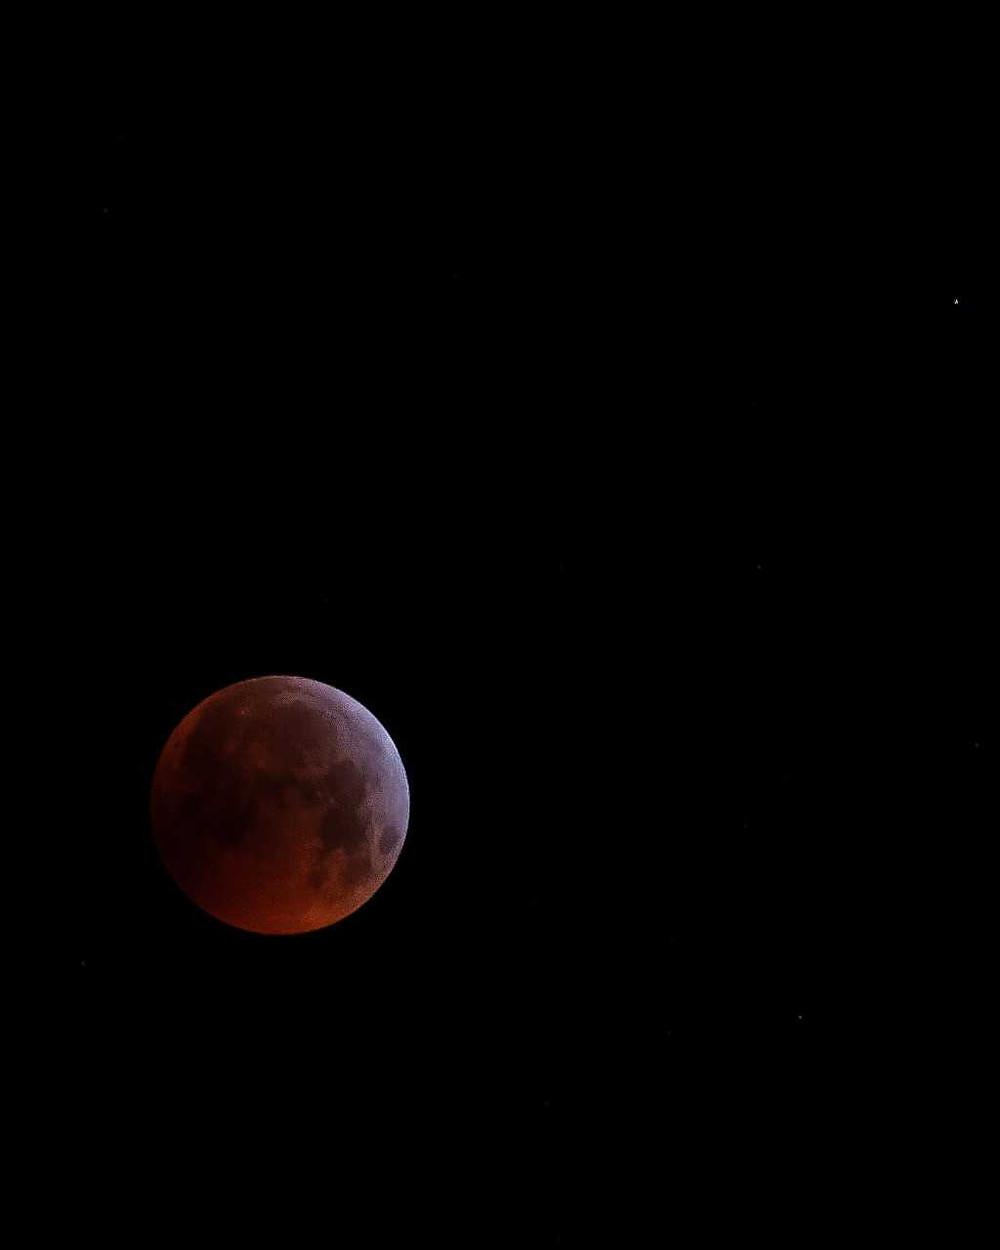 The 2019 Lunar Eclipse captured from Black Rock Beach Resort at Millendreath Beach, Cornwall